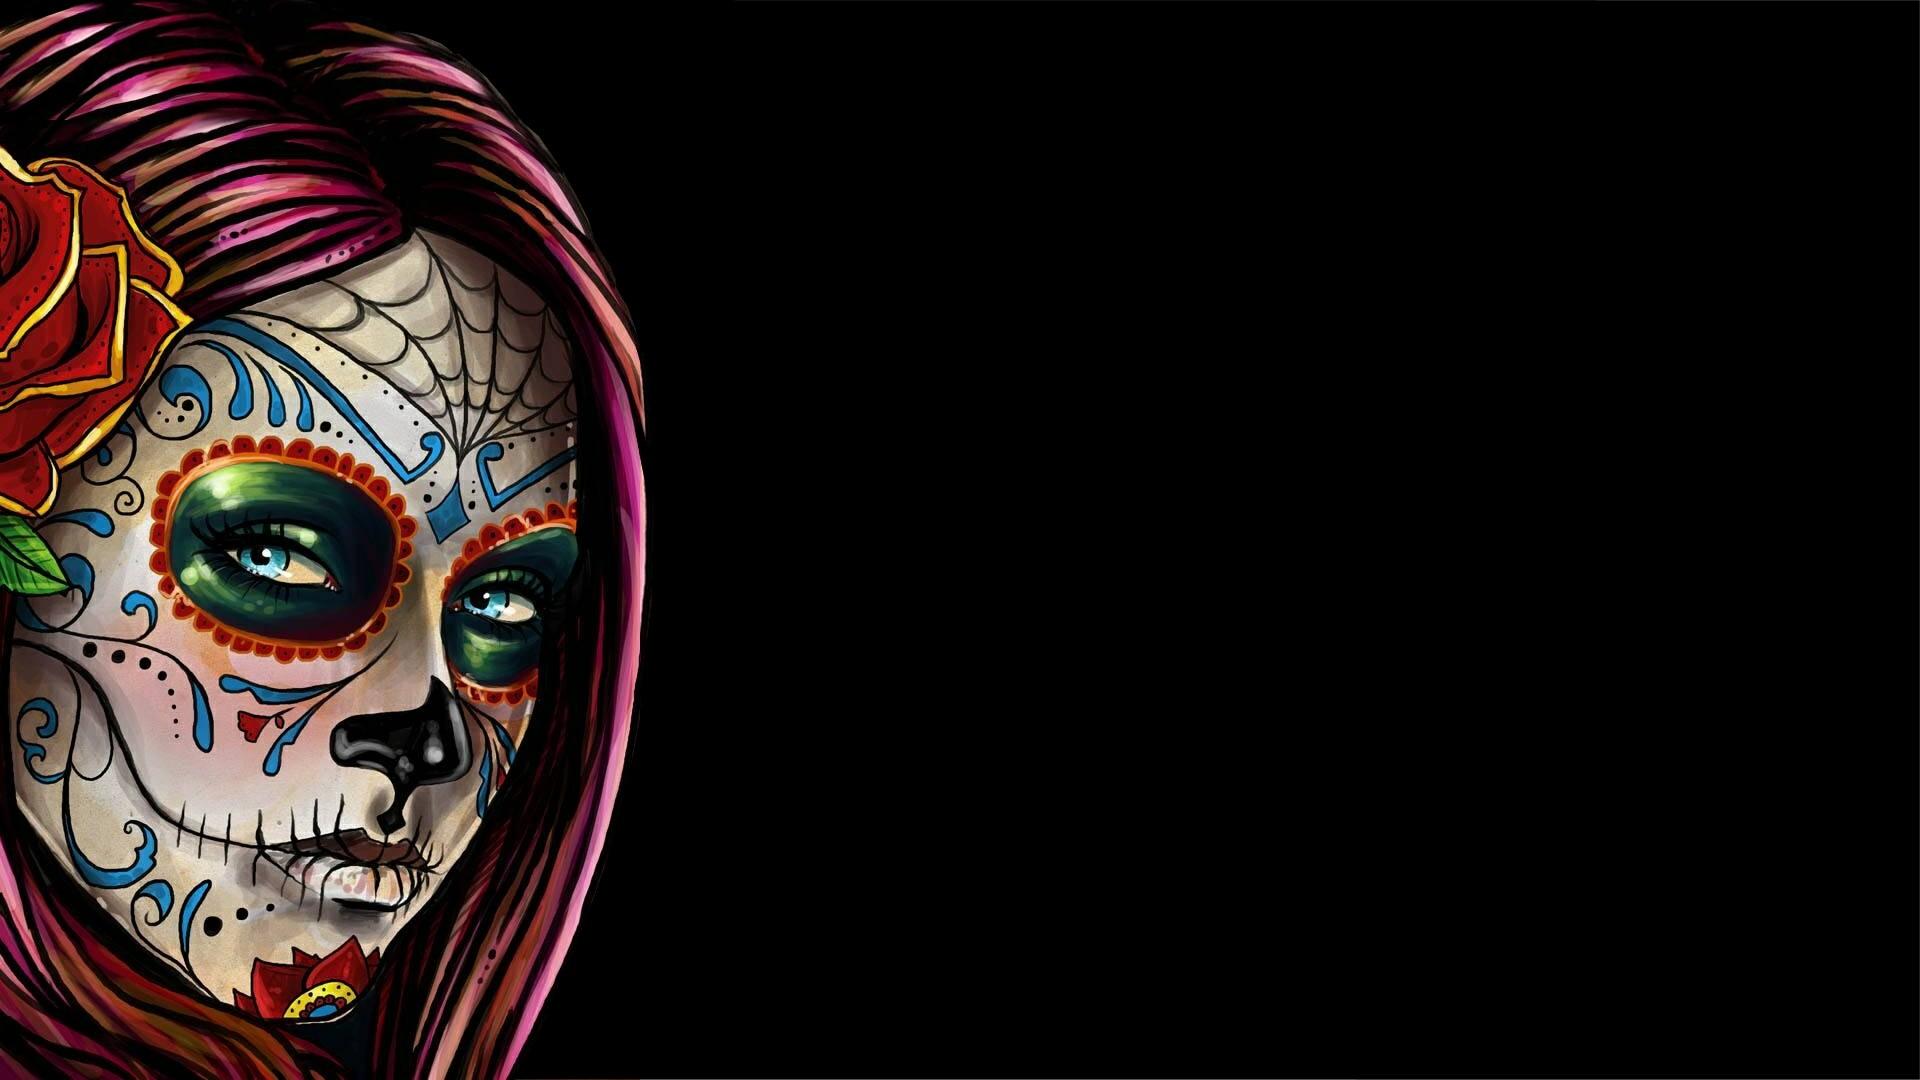 Sugar Skull Wallpaper 1 Download Free Cool Full HD Wallpapers For